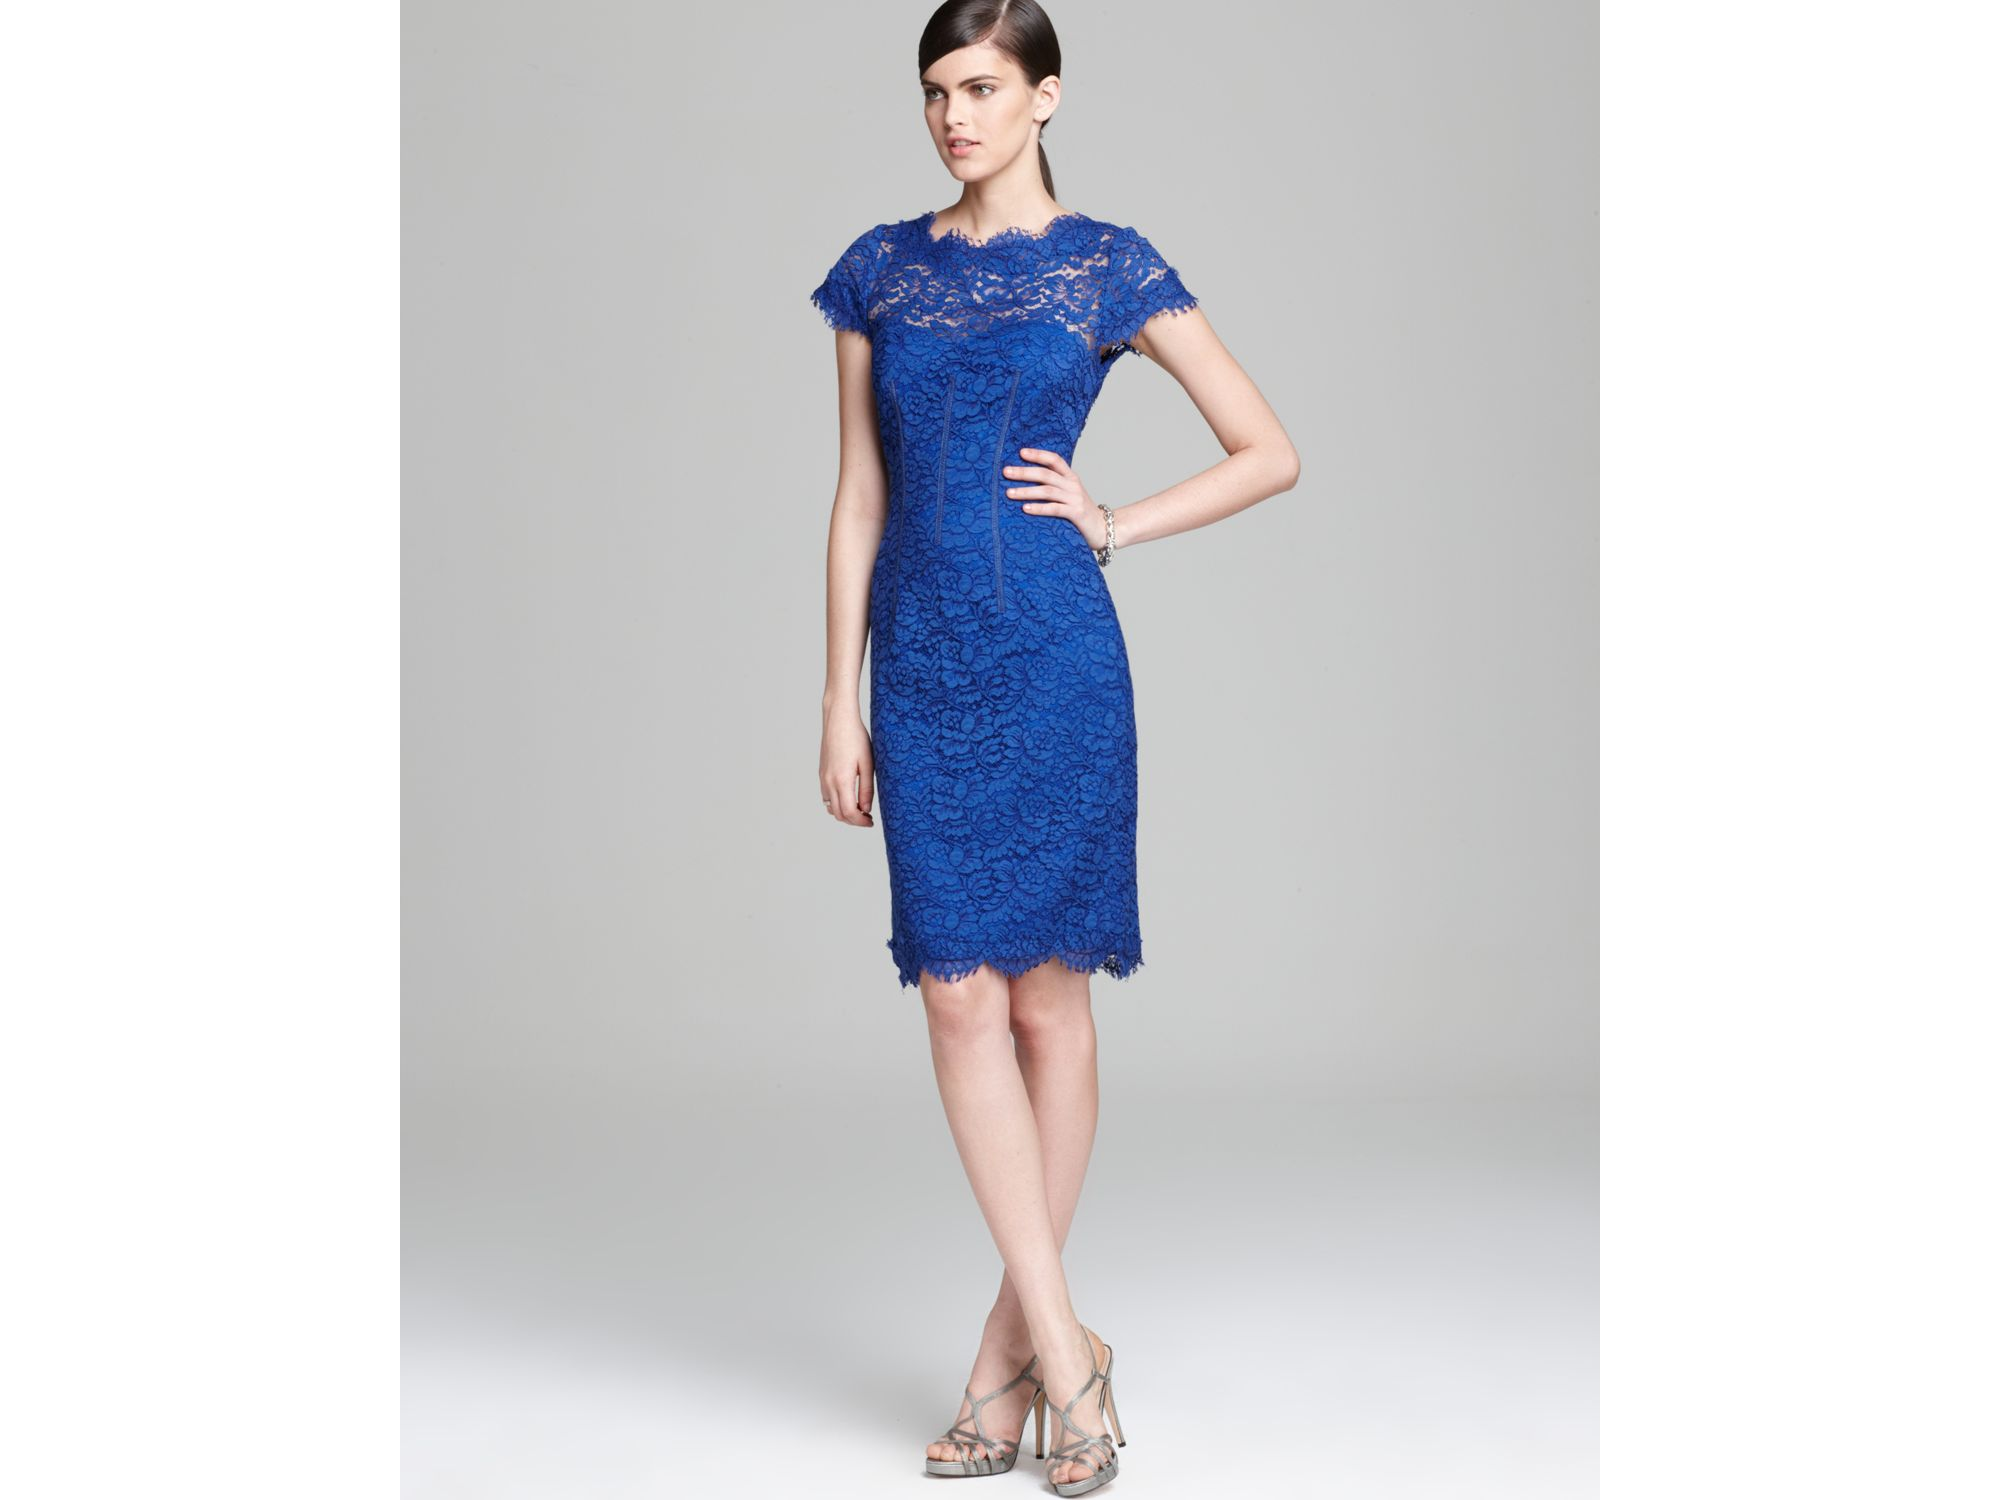 Lace Dress Cap Sleeve Sheath